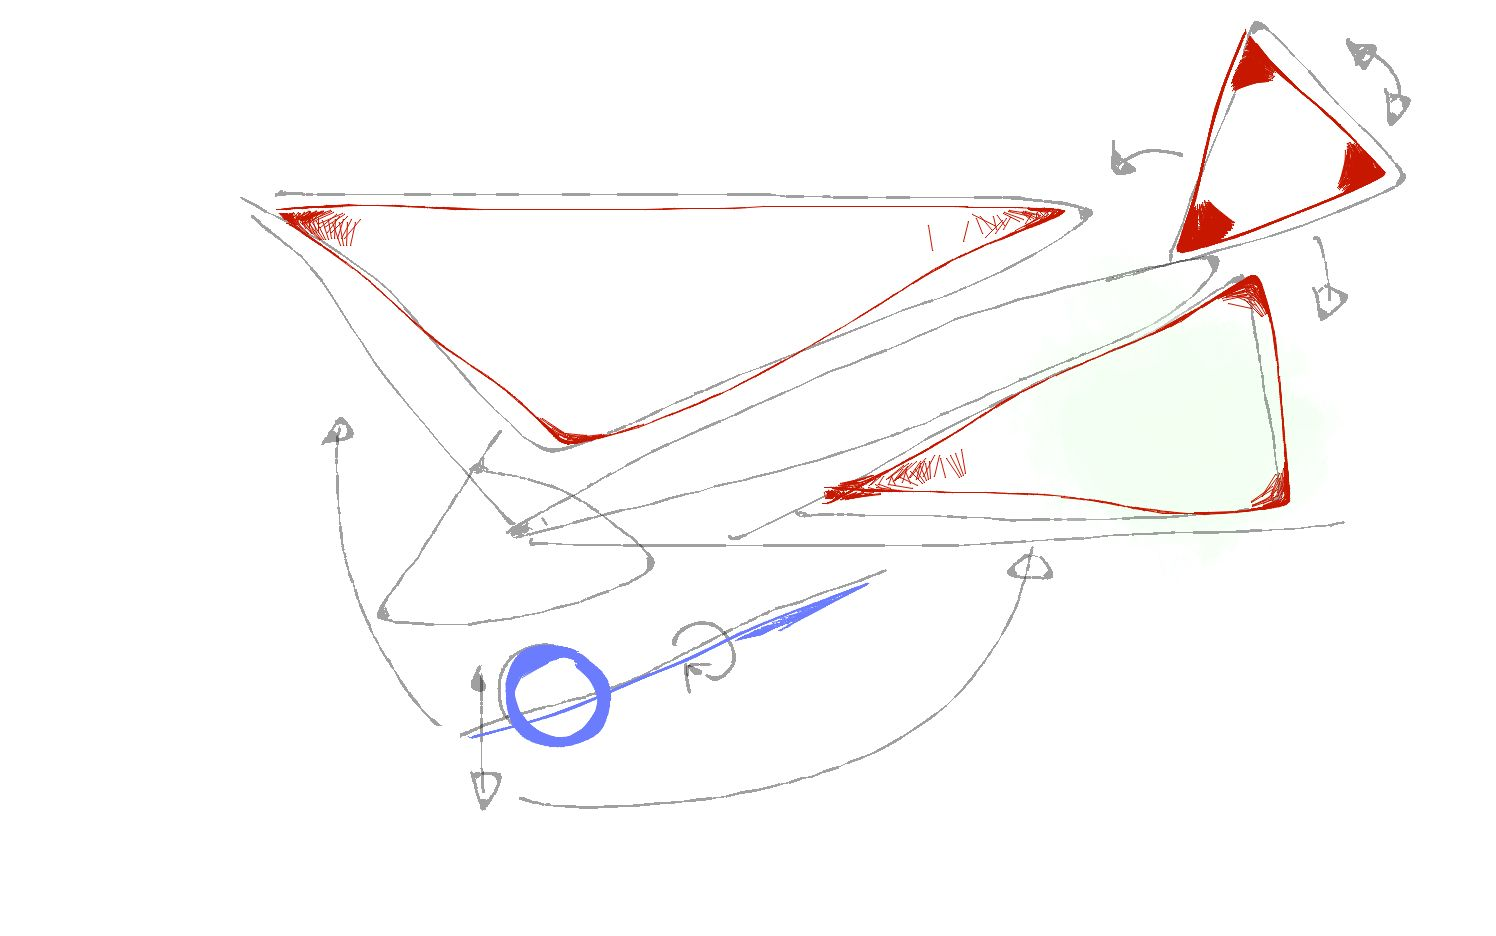 Ornithopter Development